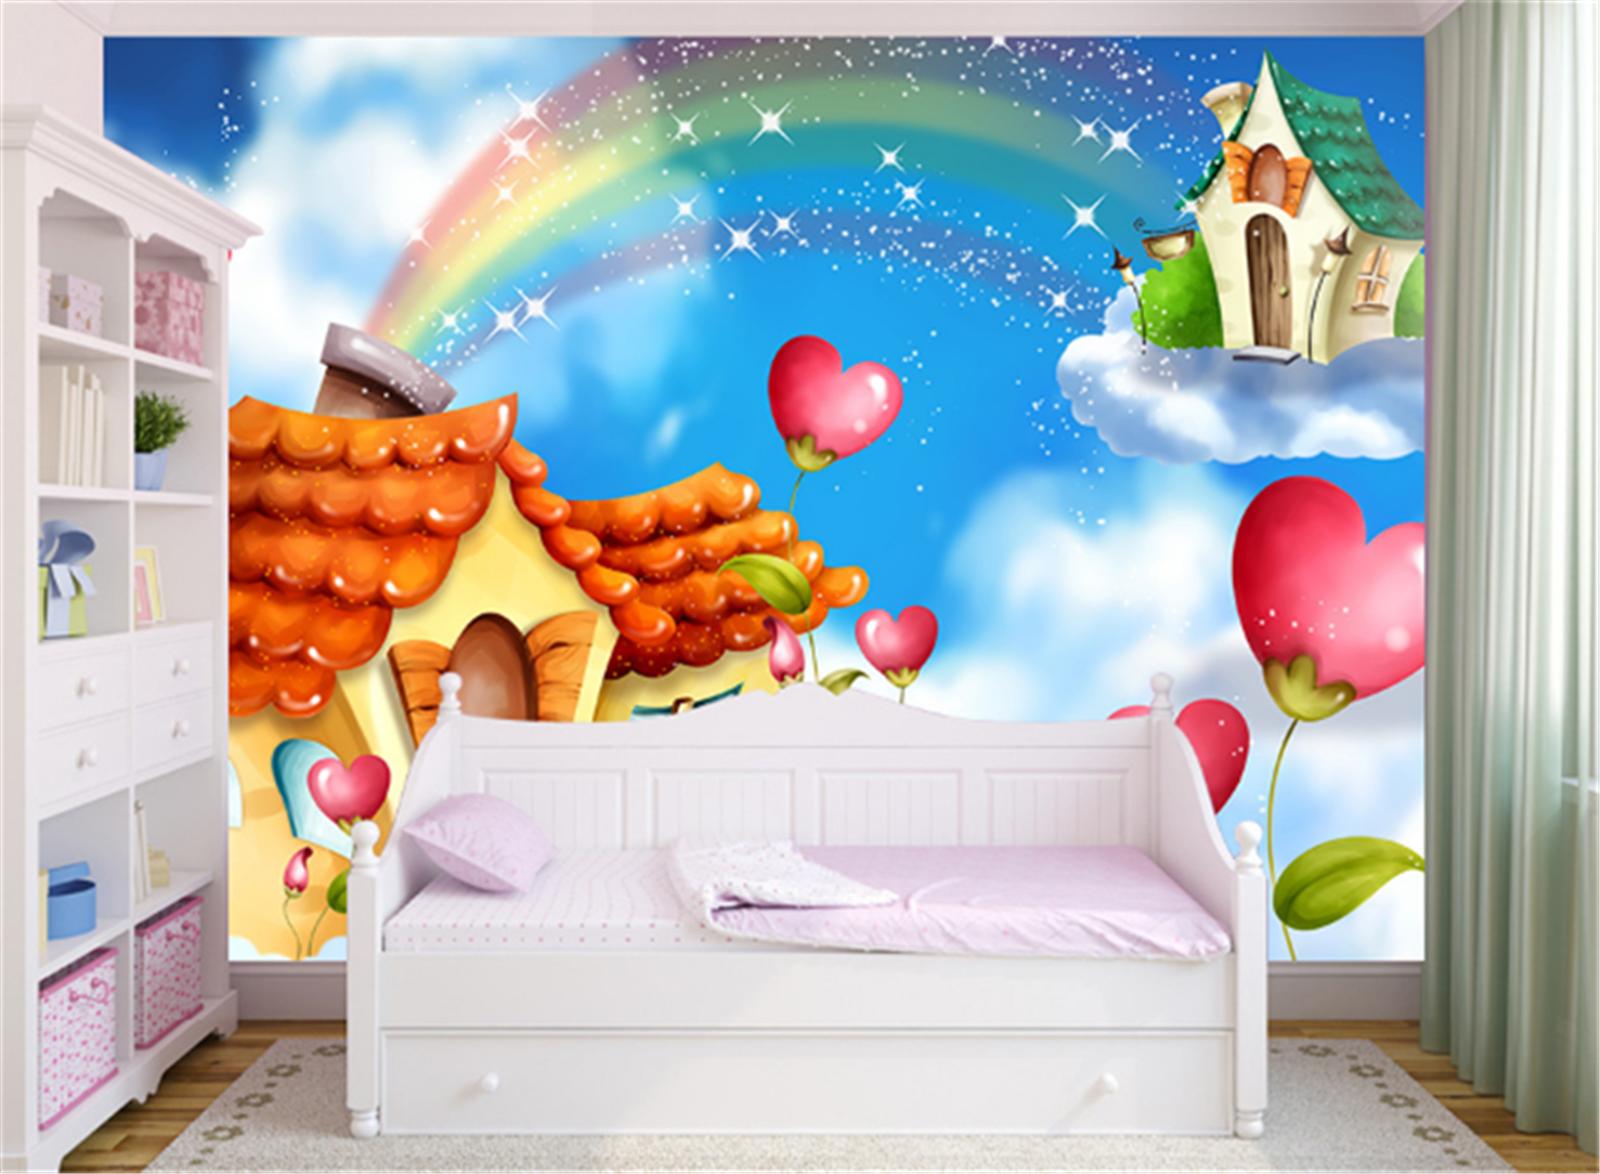 3D Himmel Karikatur Haus 8003 Tapete Wandgemälde Tapeten Bild Familie Familie Familie DE Lemon   Lebhaft und liebenswert    Deutschland Store     321579